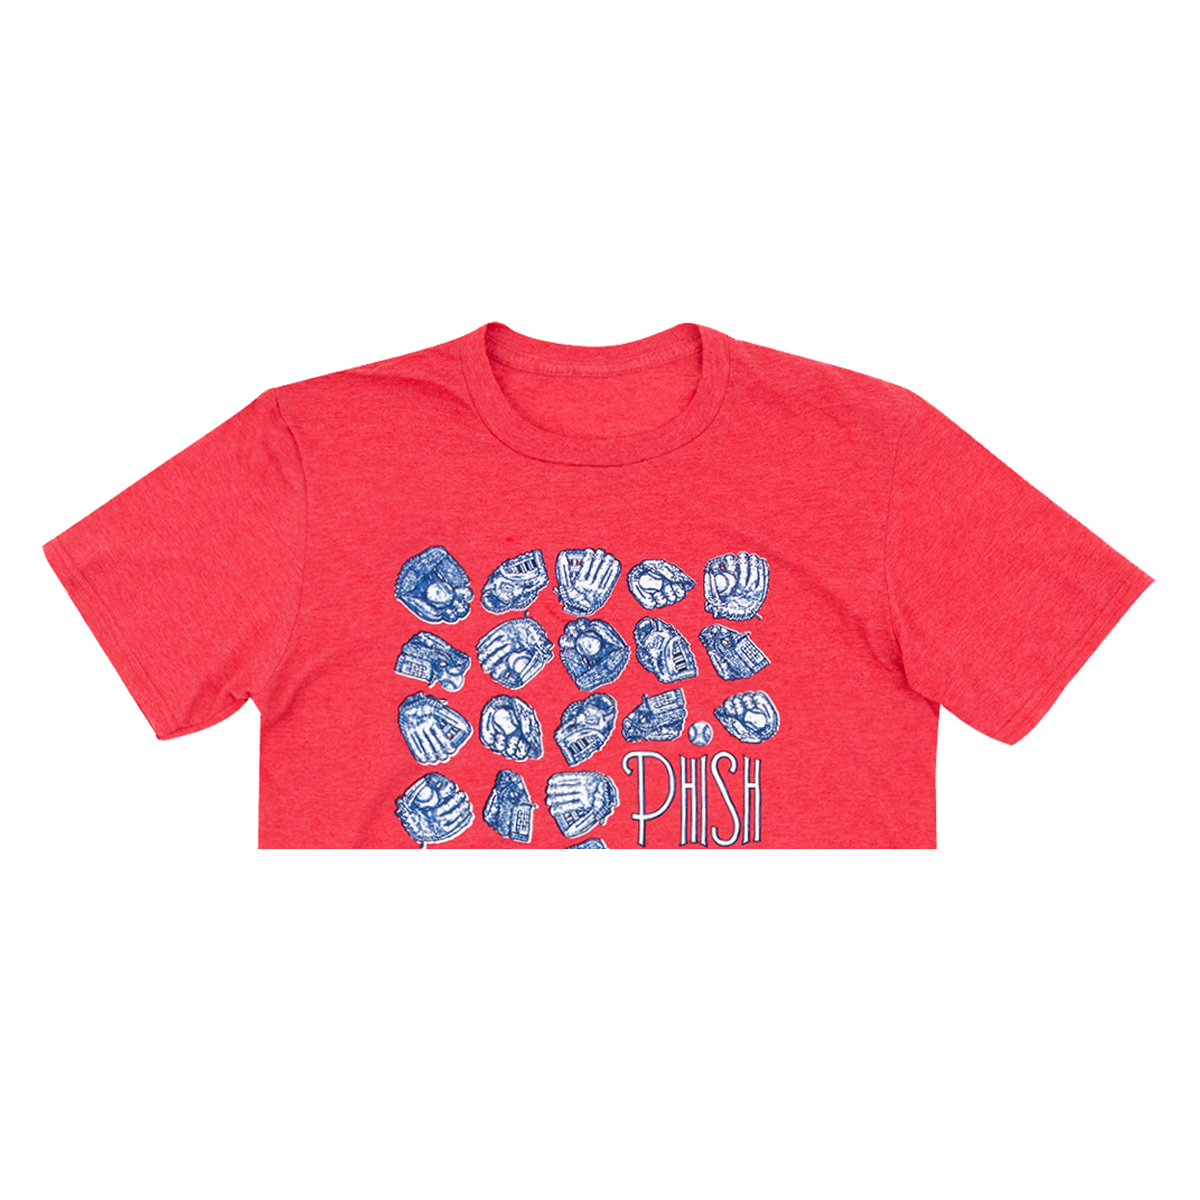 Landland Classic Mitts T-Shirt